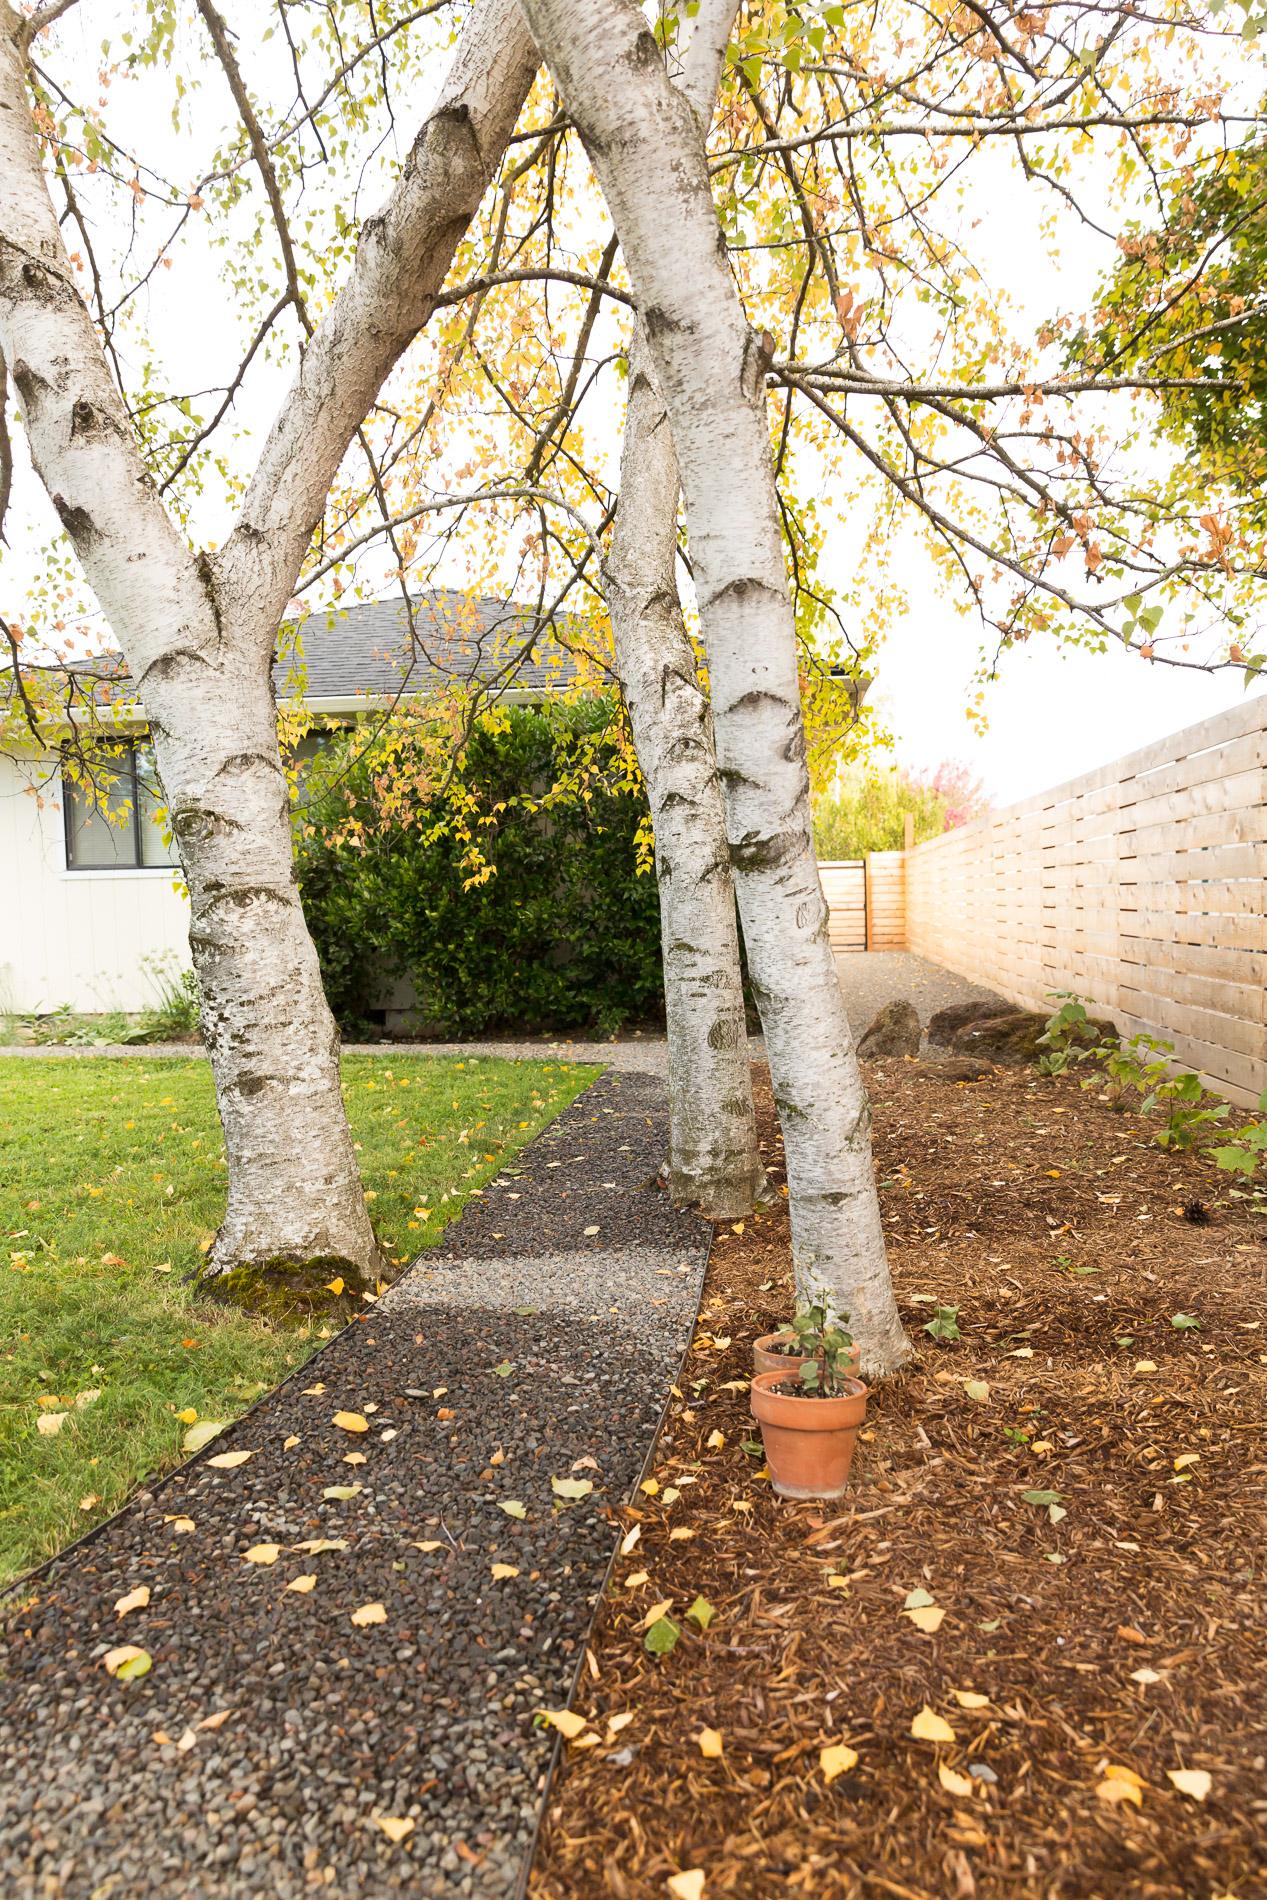 Weaving Gravel Pathway + Birch Trees